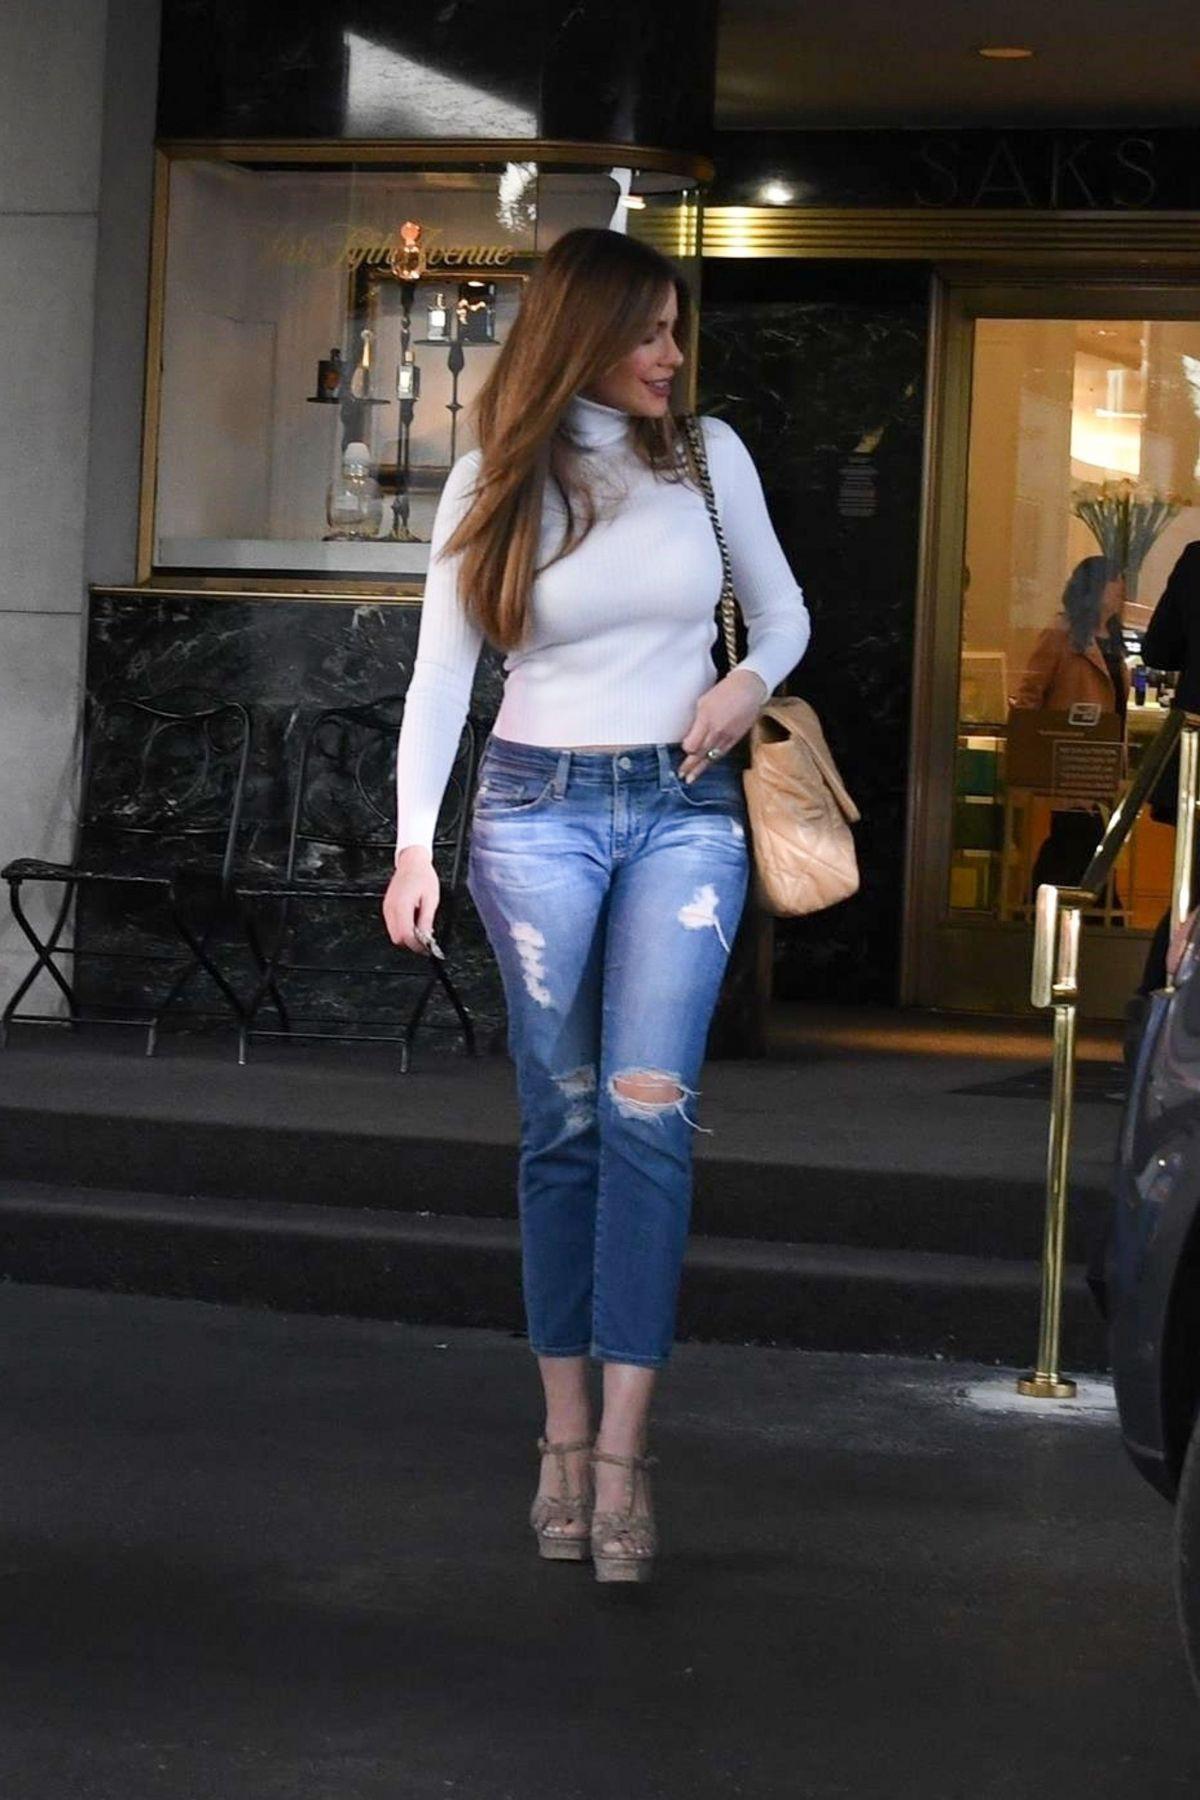 Sofia Vergara - Sexy Boobs at Saks Fifth Avenue in Beverly